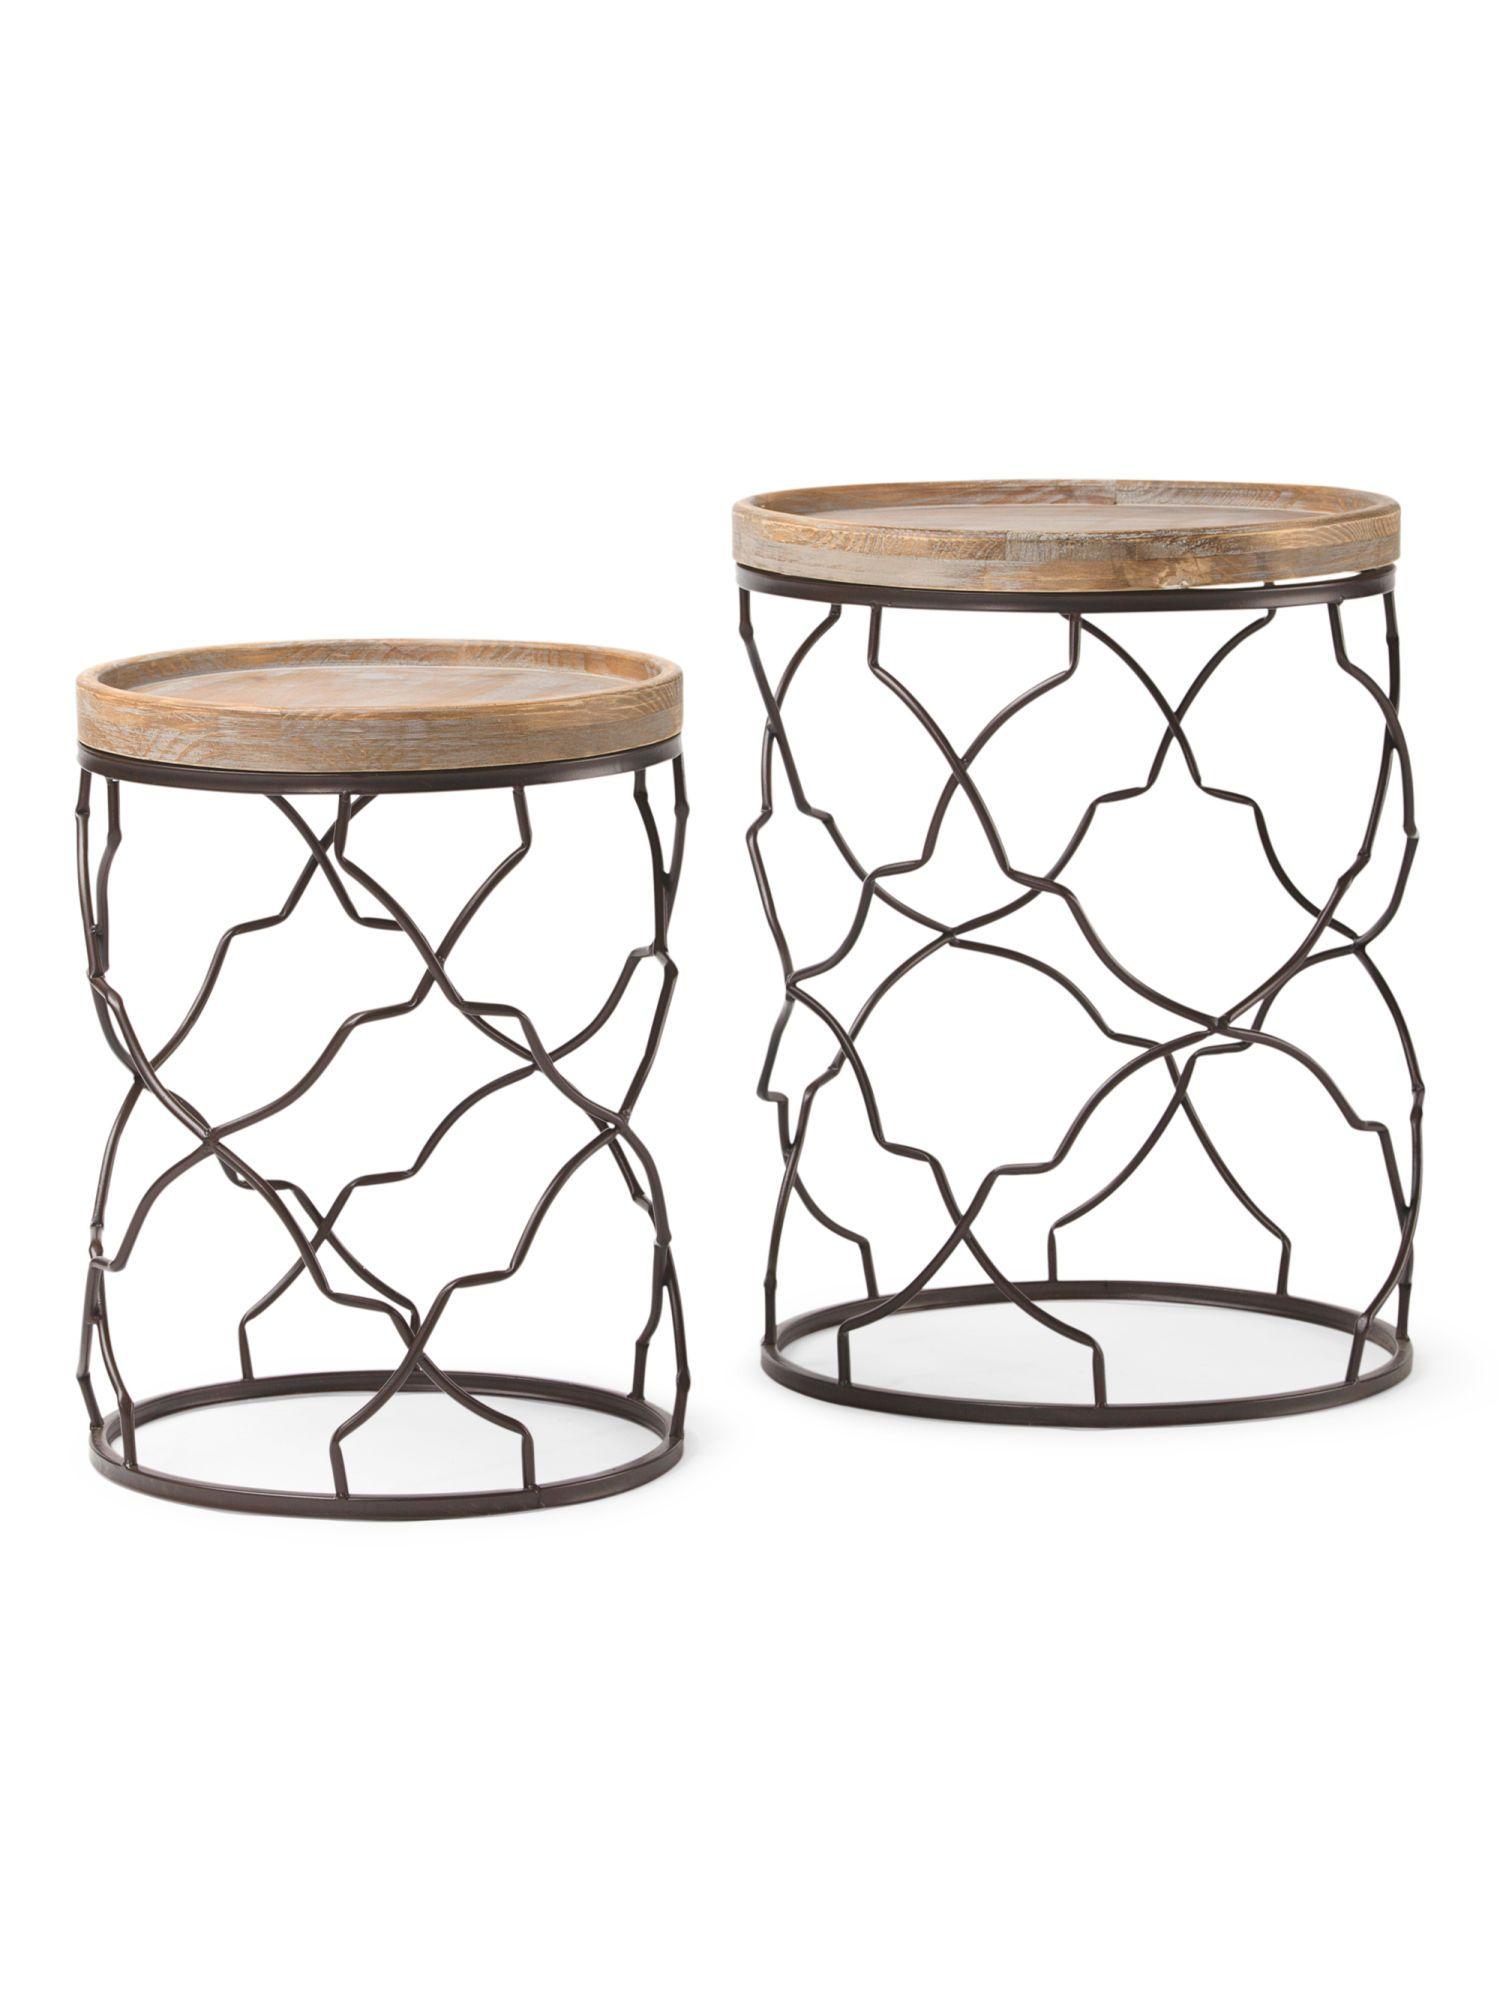 Set Of 2 Decorative Accent Tables